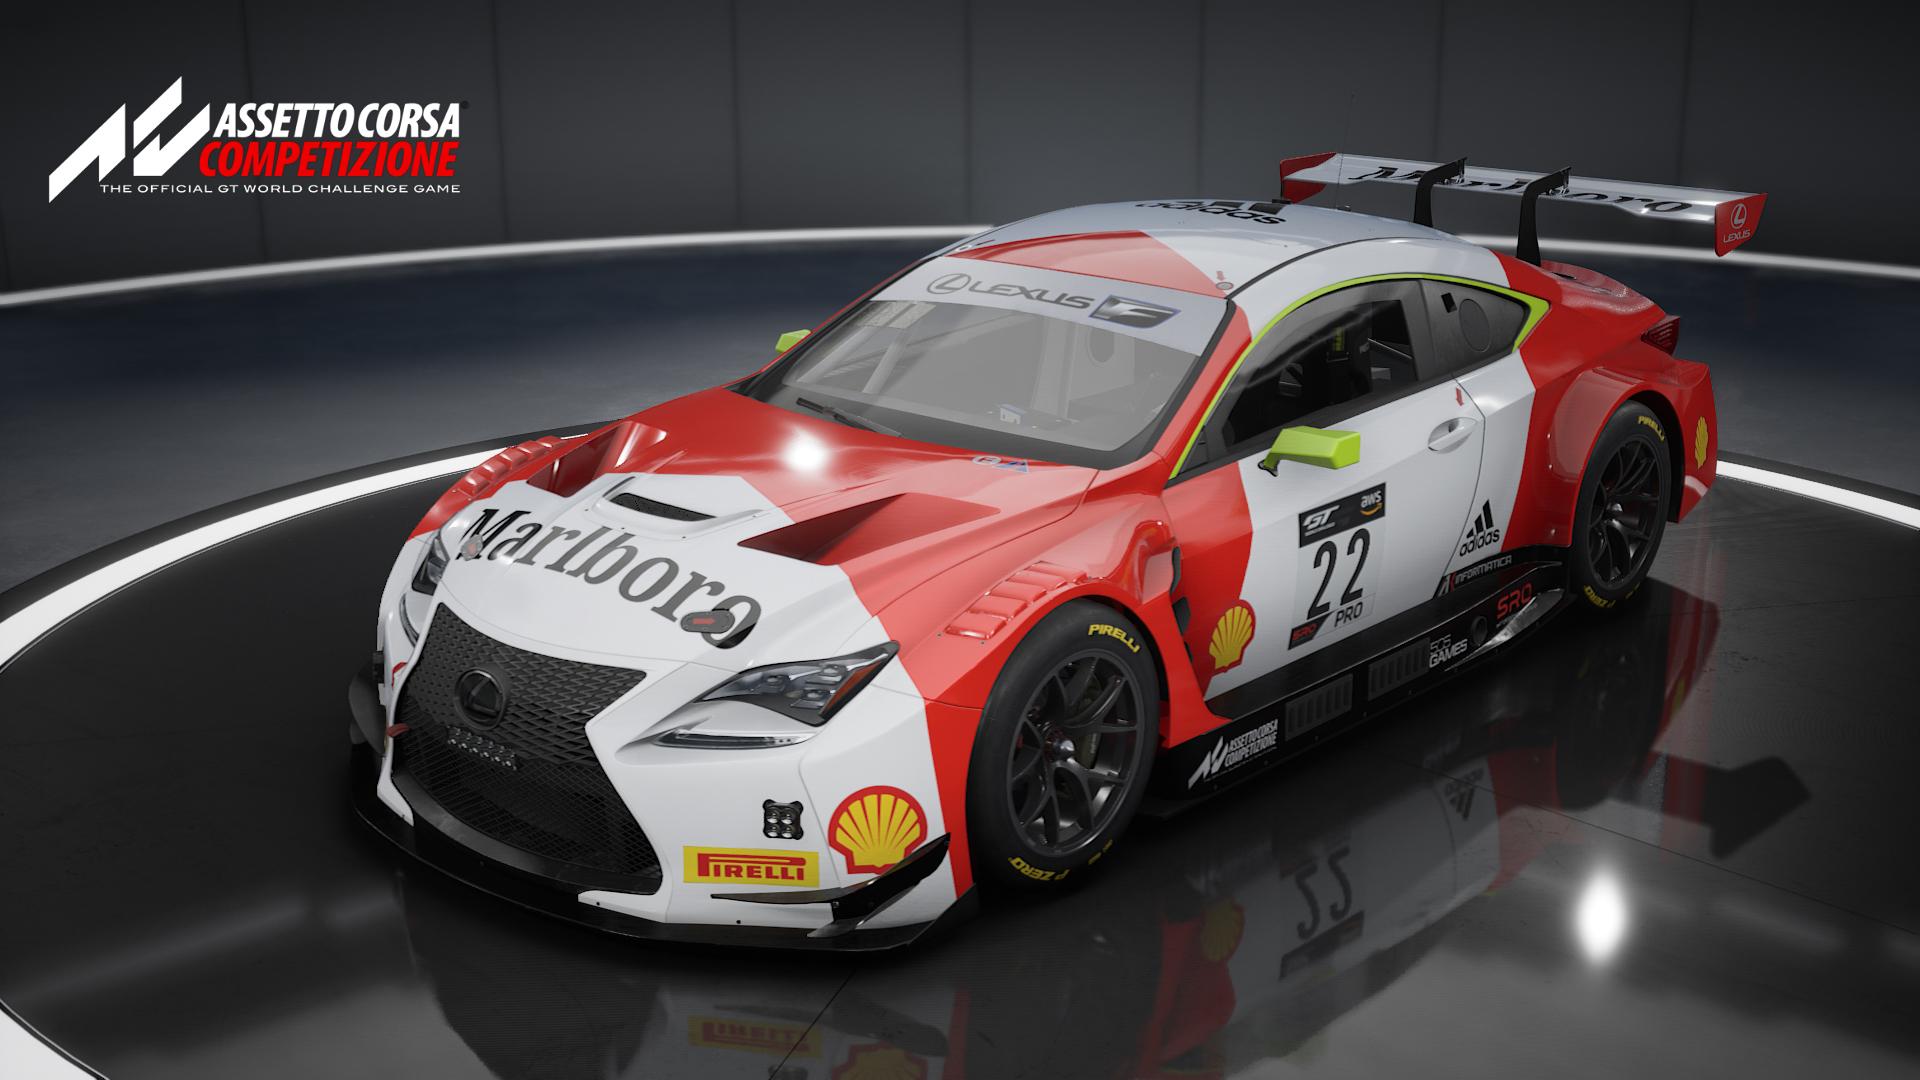 Marlboro Lexus Front.jpg